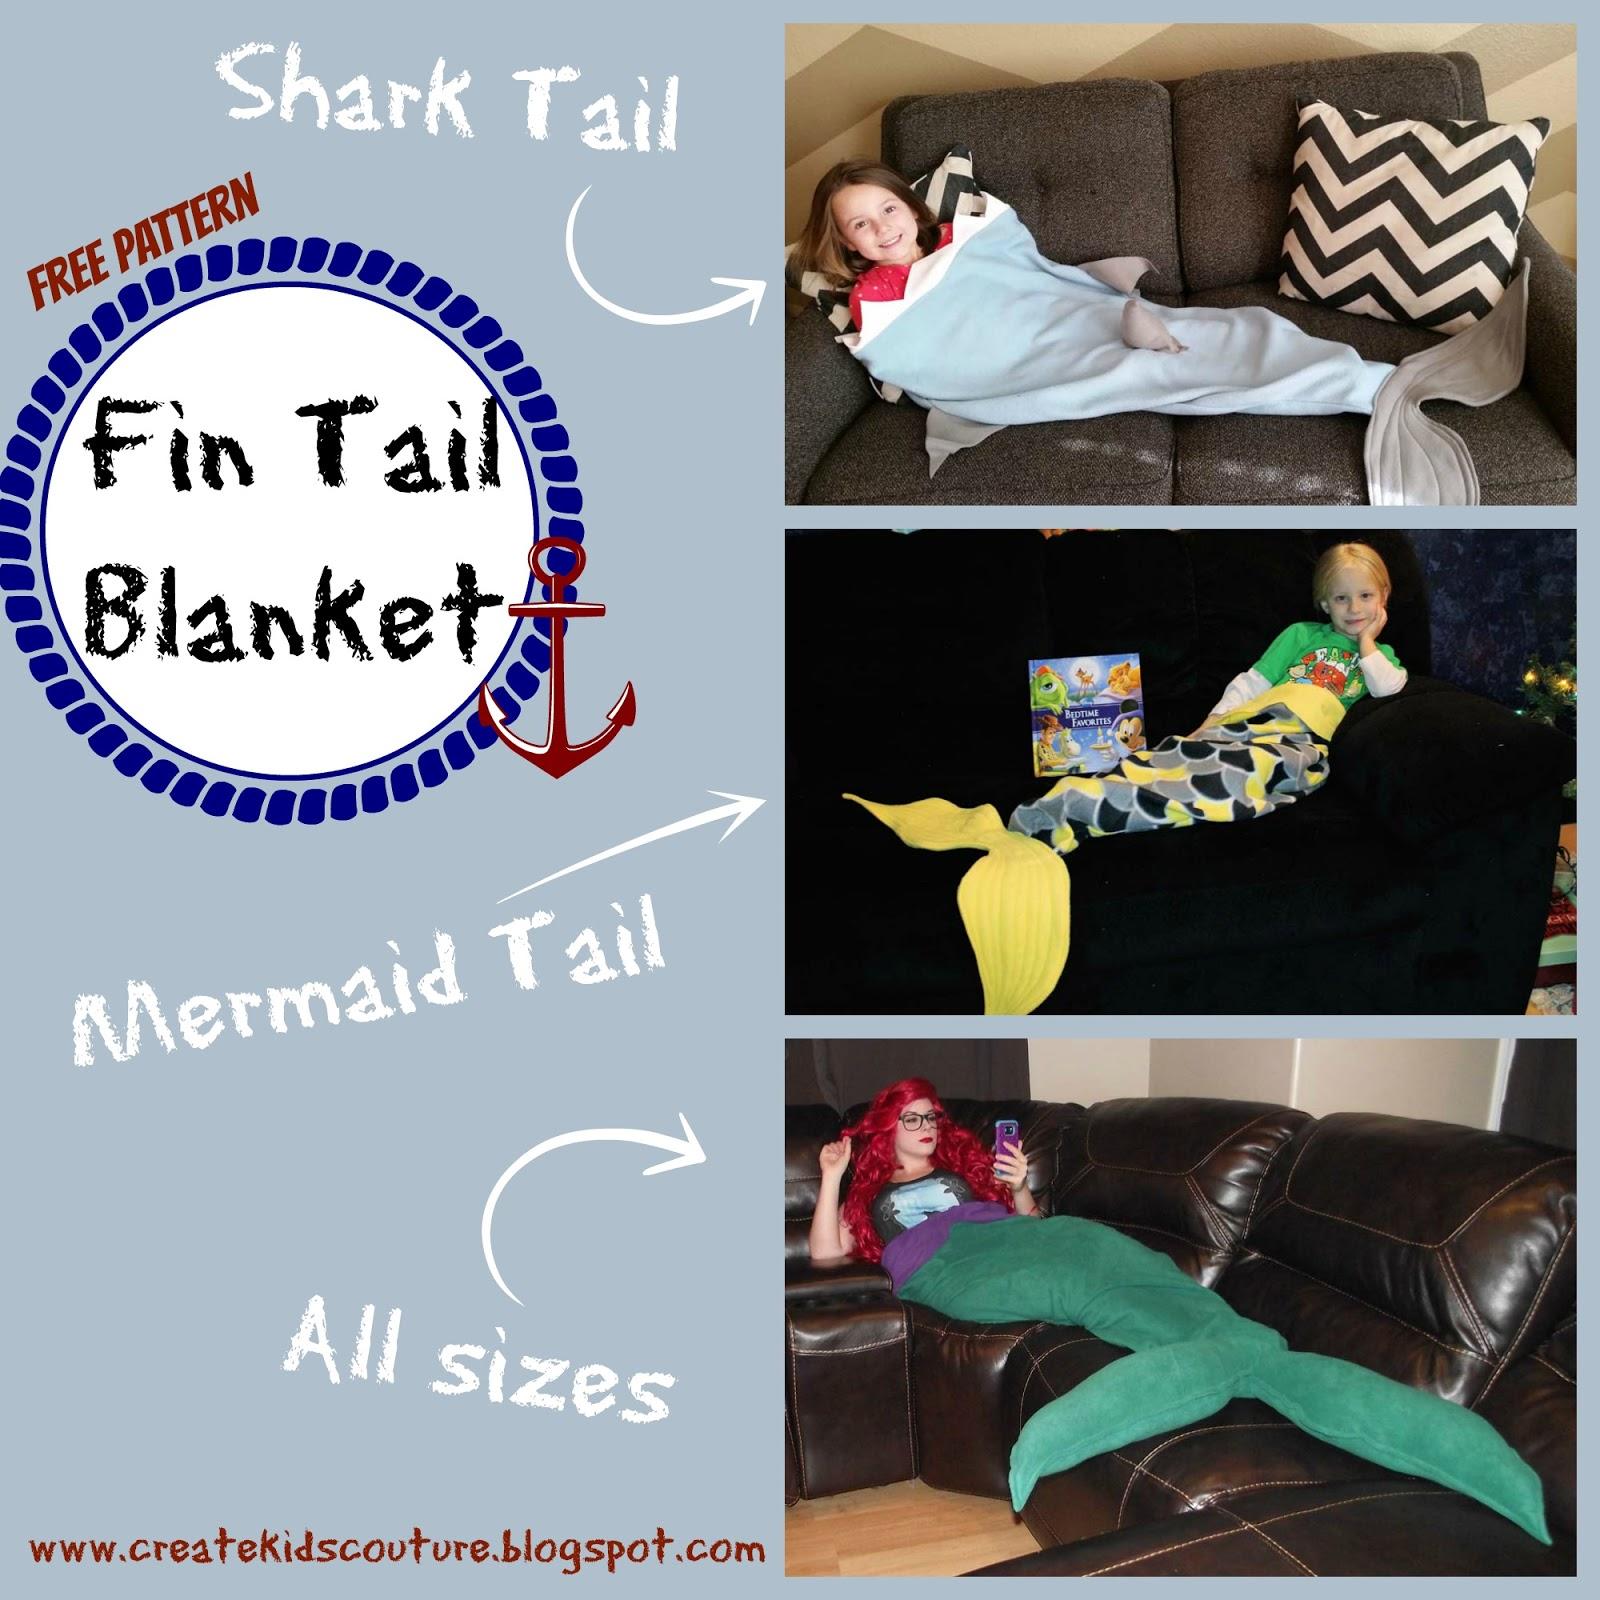 Create kids couture sharkmermaid tail blanket friday december 11 2015 jeuxipadfo Choice Image